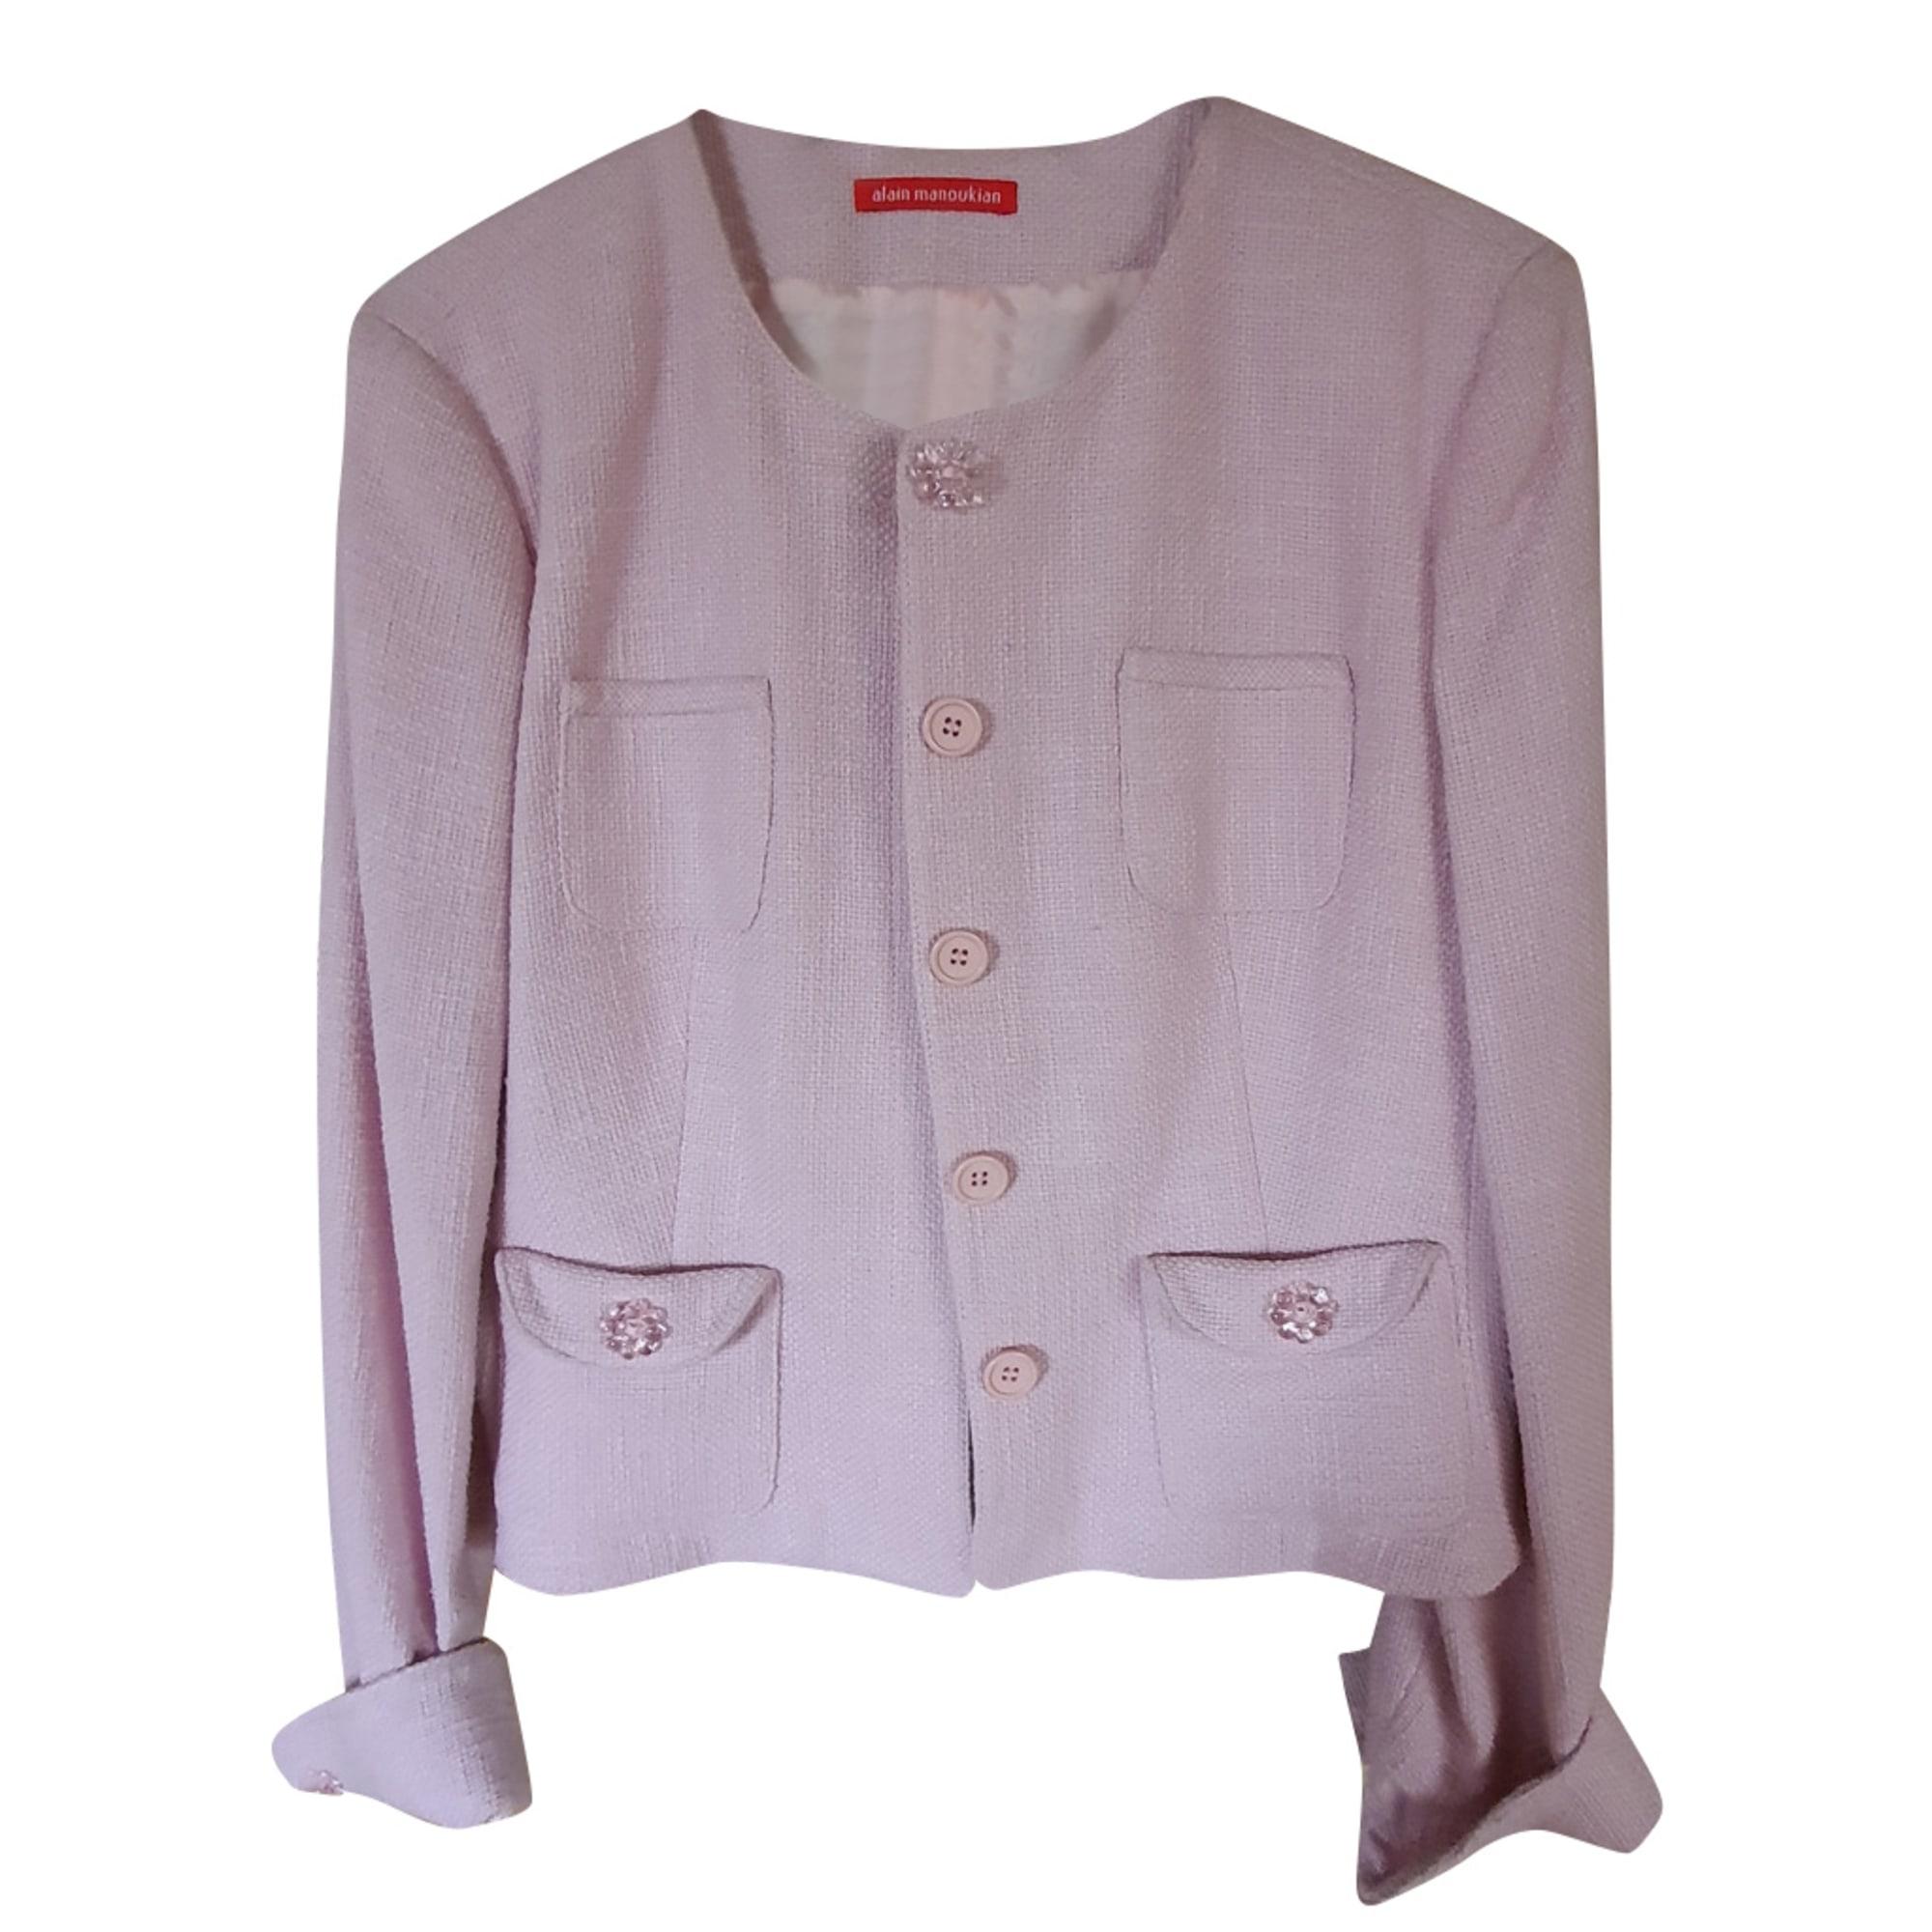 Blazer ALAIN MANOUKIAN Pink, fuchsia, light pink